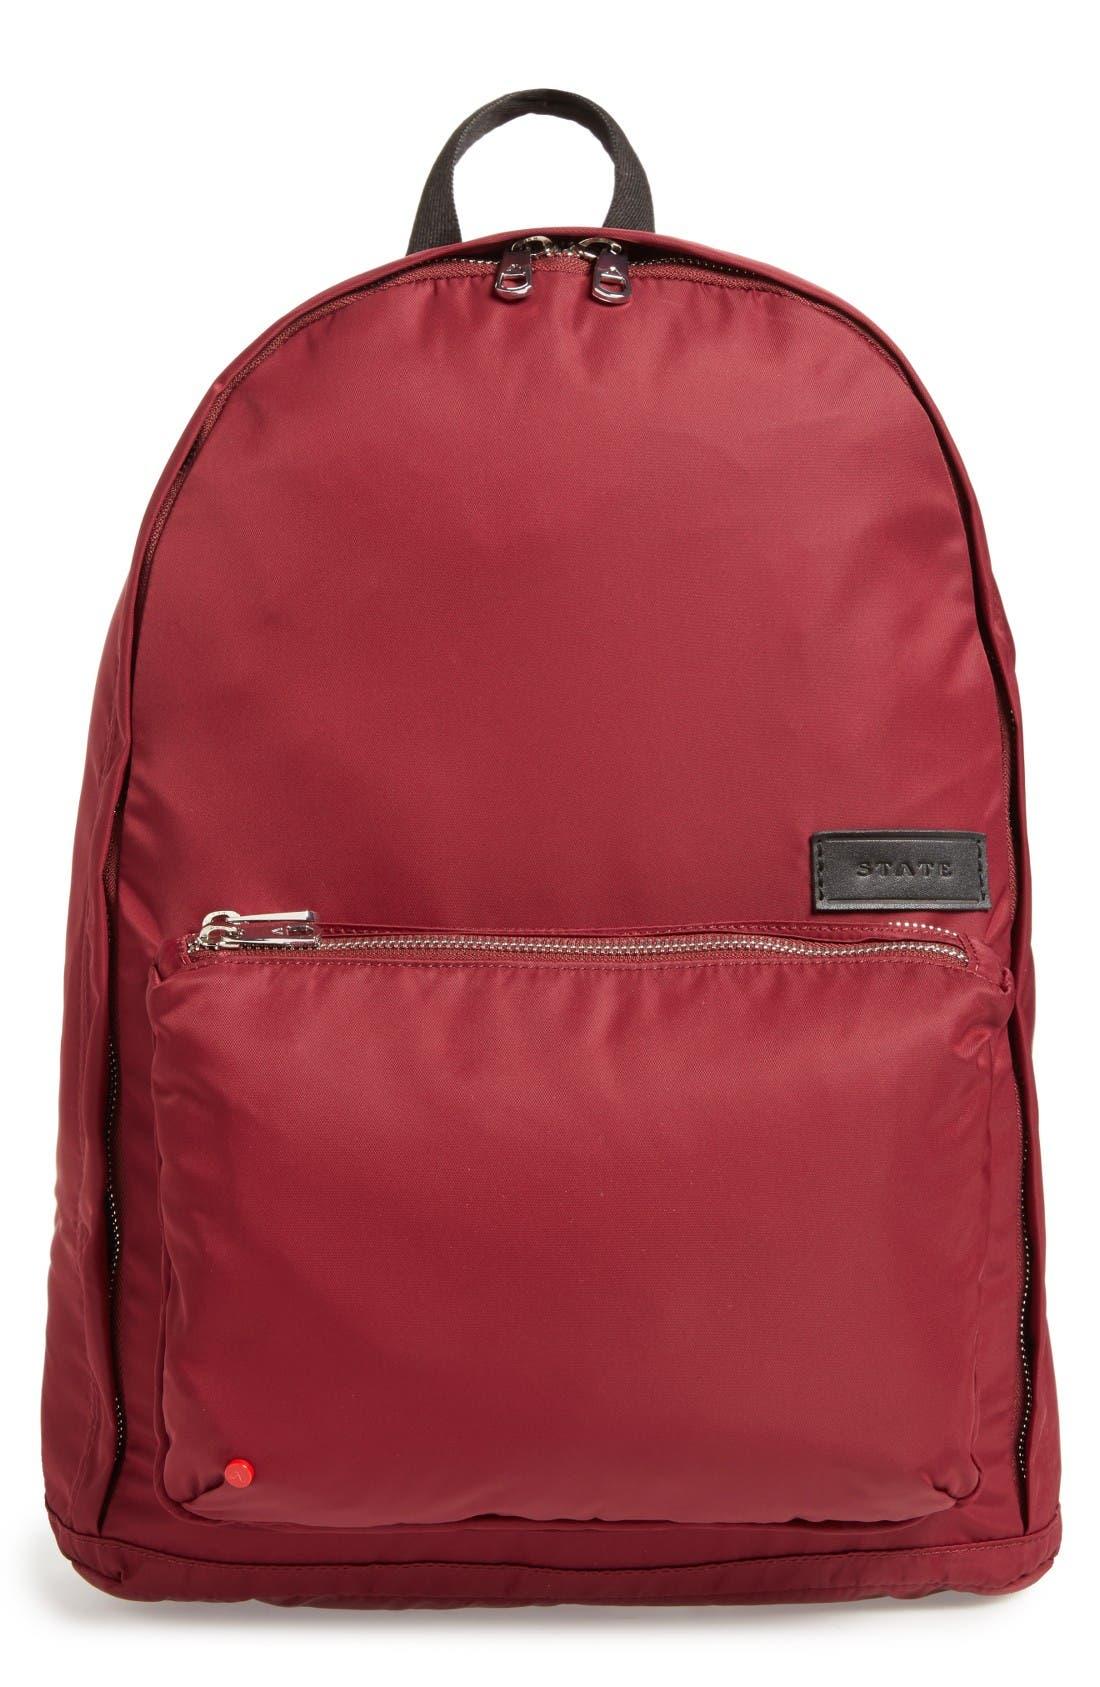 STATE Bags Lorimer Nylon Backpack